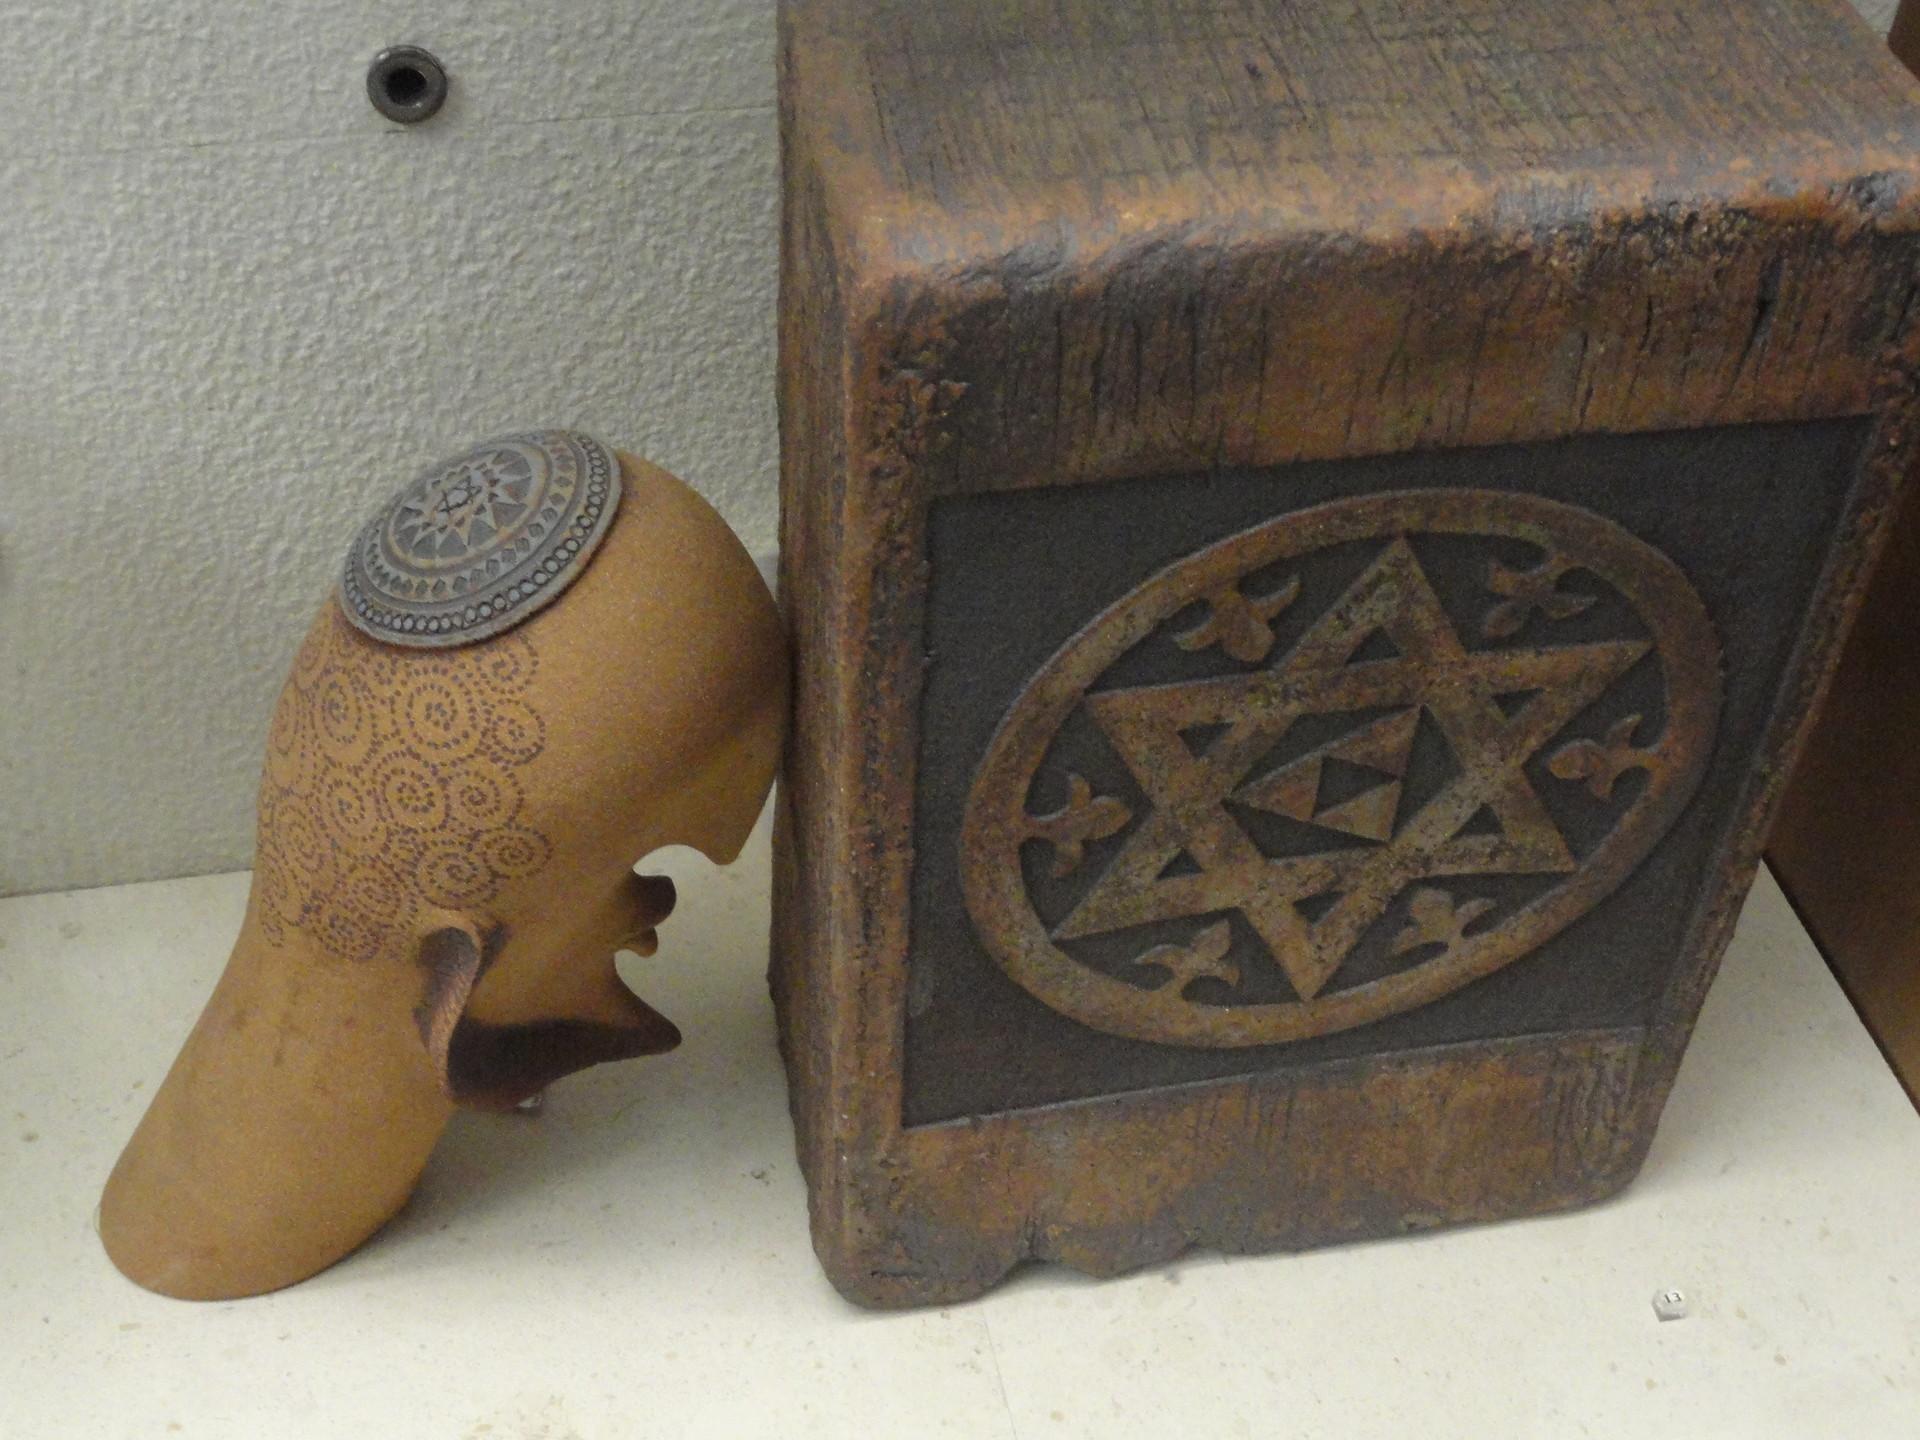 sinagoga-transito-museo-sefardi-d1c90068